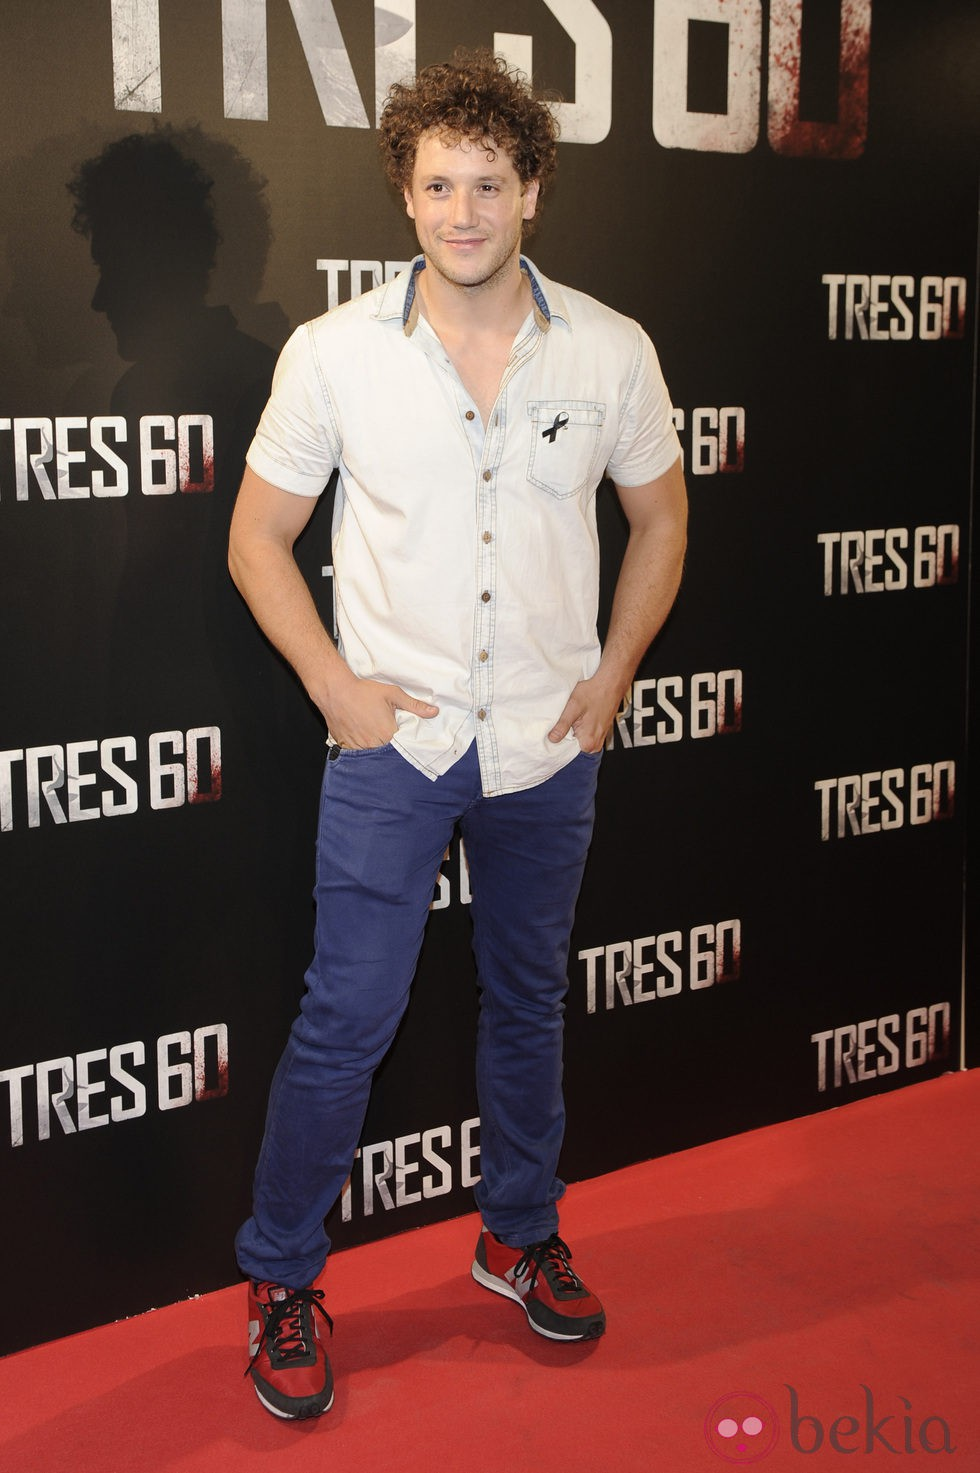 Daniel Diges en el estreno de 'Tres 60' en Madrid